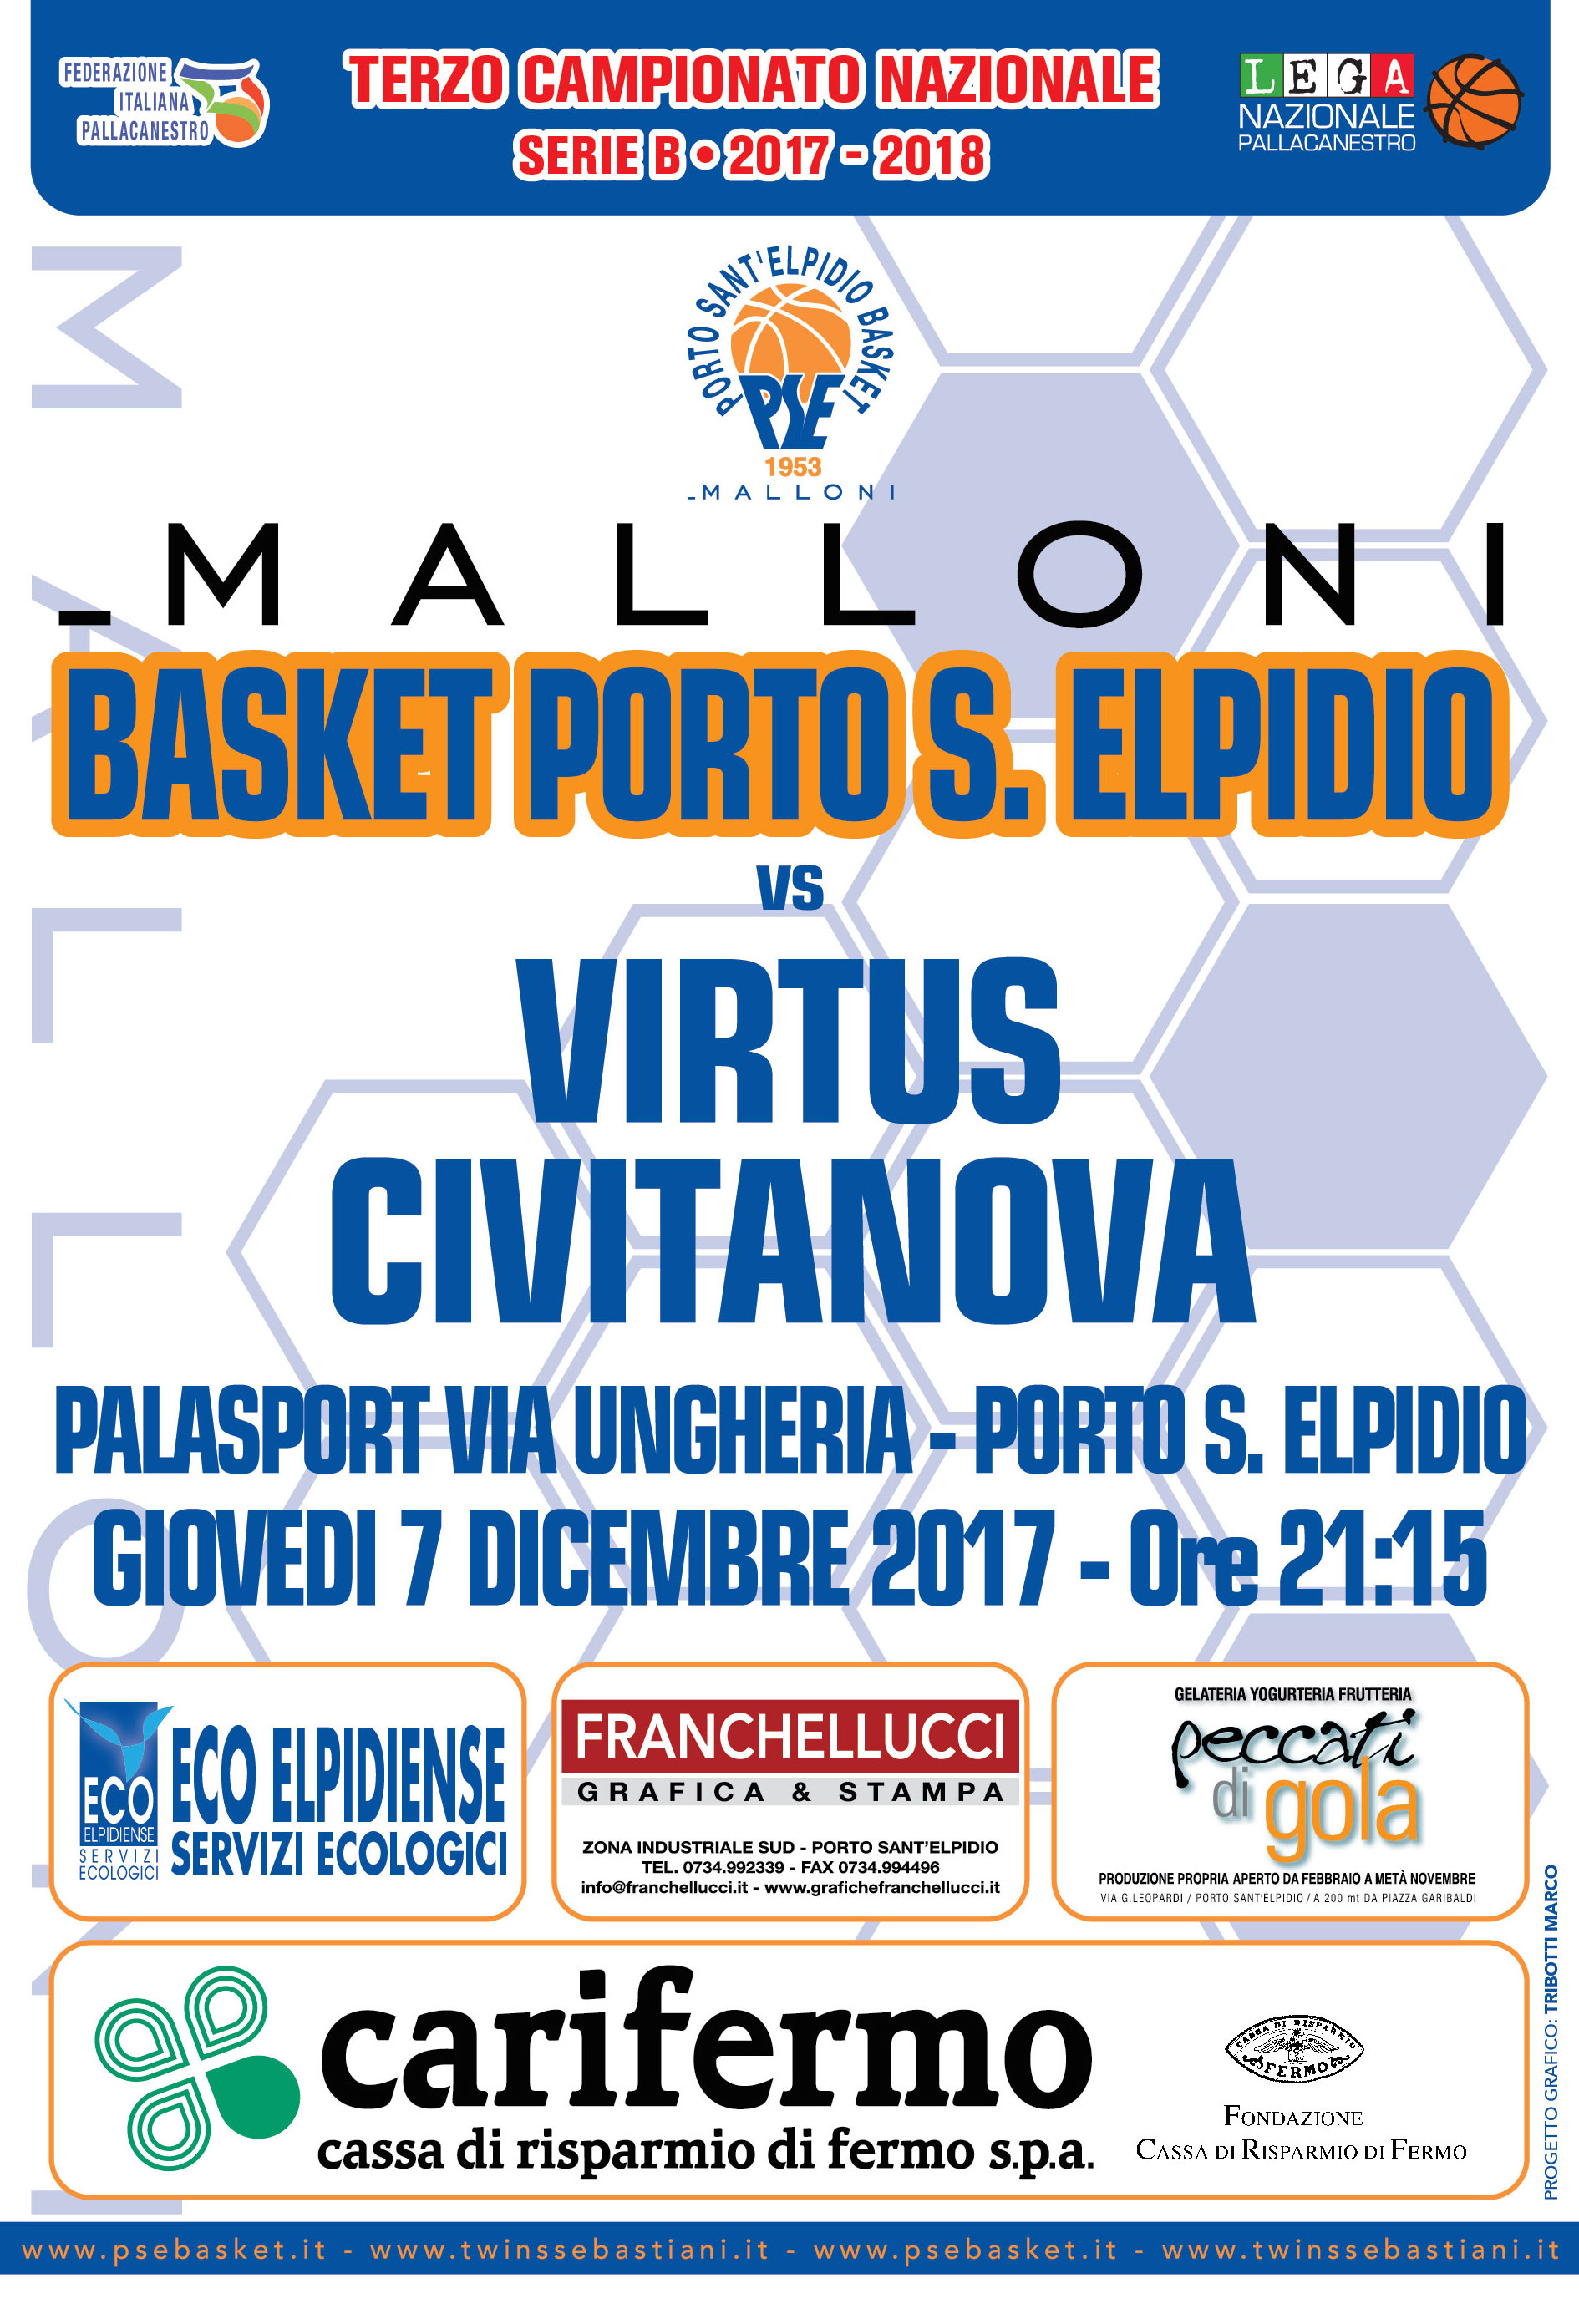 Derby Malloni-Virtus. Palas quasi sold-out, botteghini aperti dalle 19.15